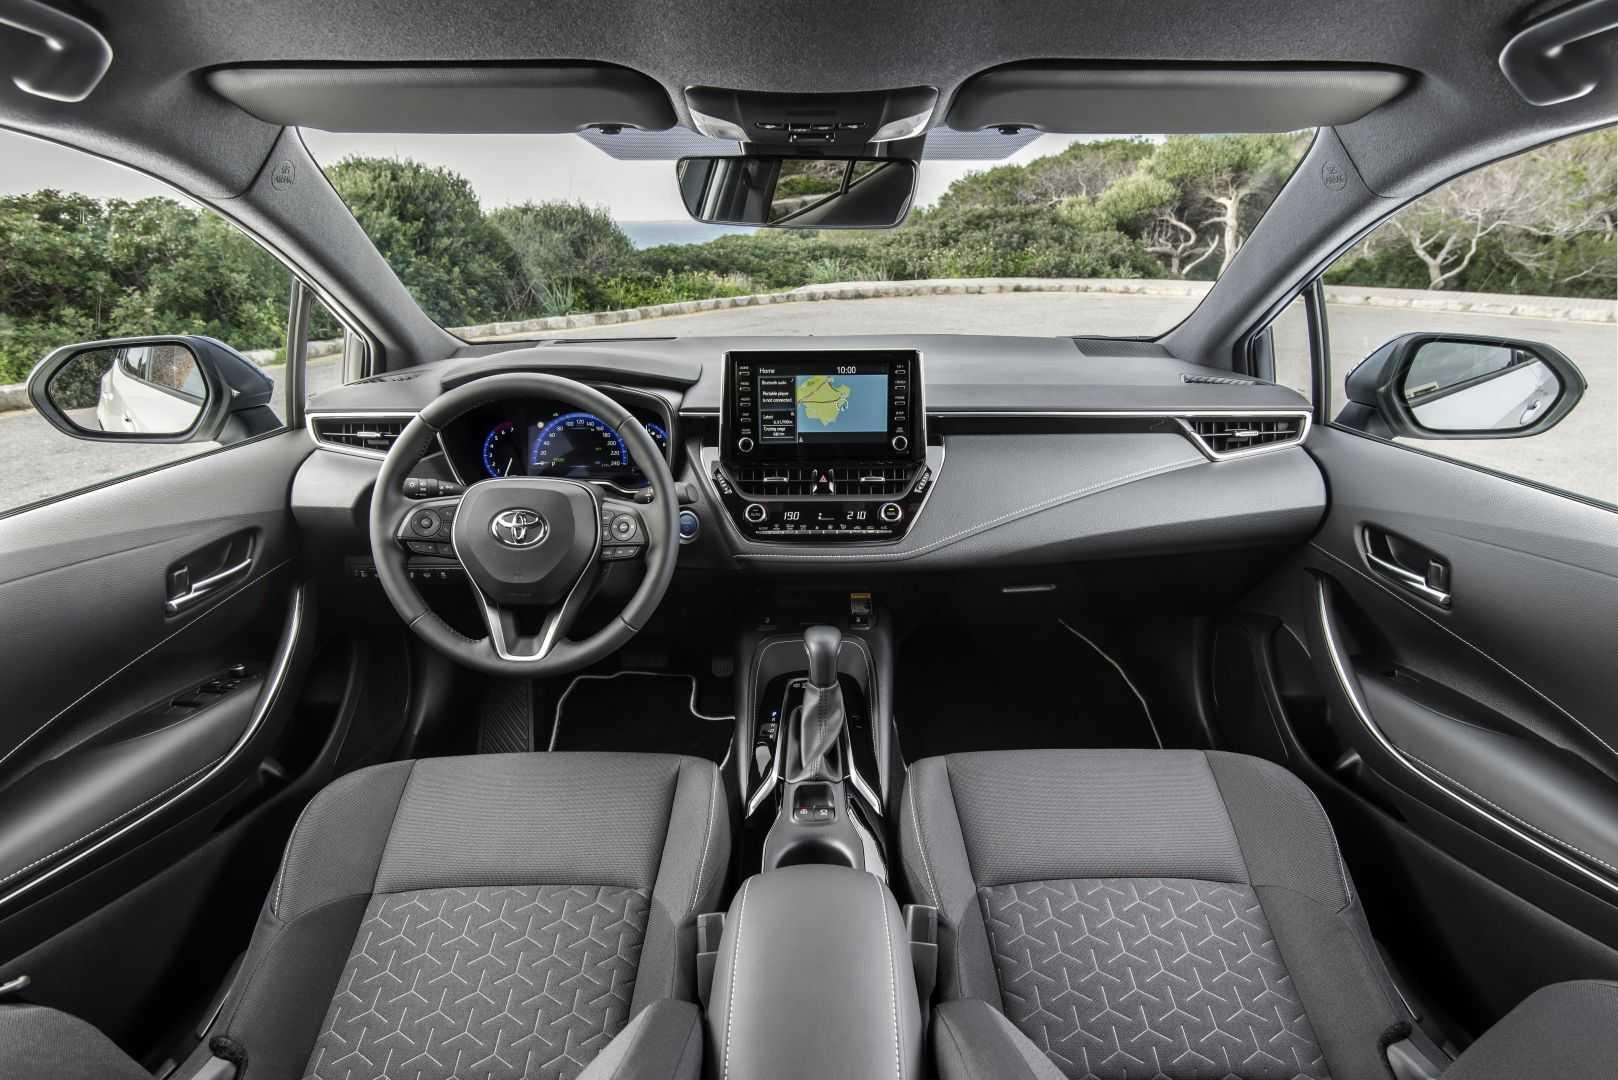 Toyota corolla рестайлинг 2016, седан, 11 поколение, e180 (03.2016 - 01.2019) - технические характеристики и комплектации